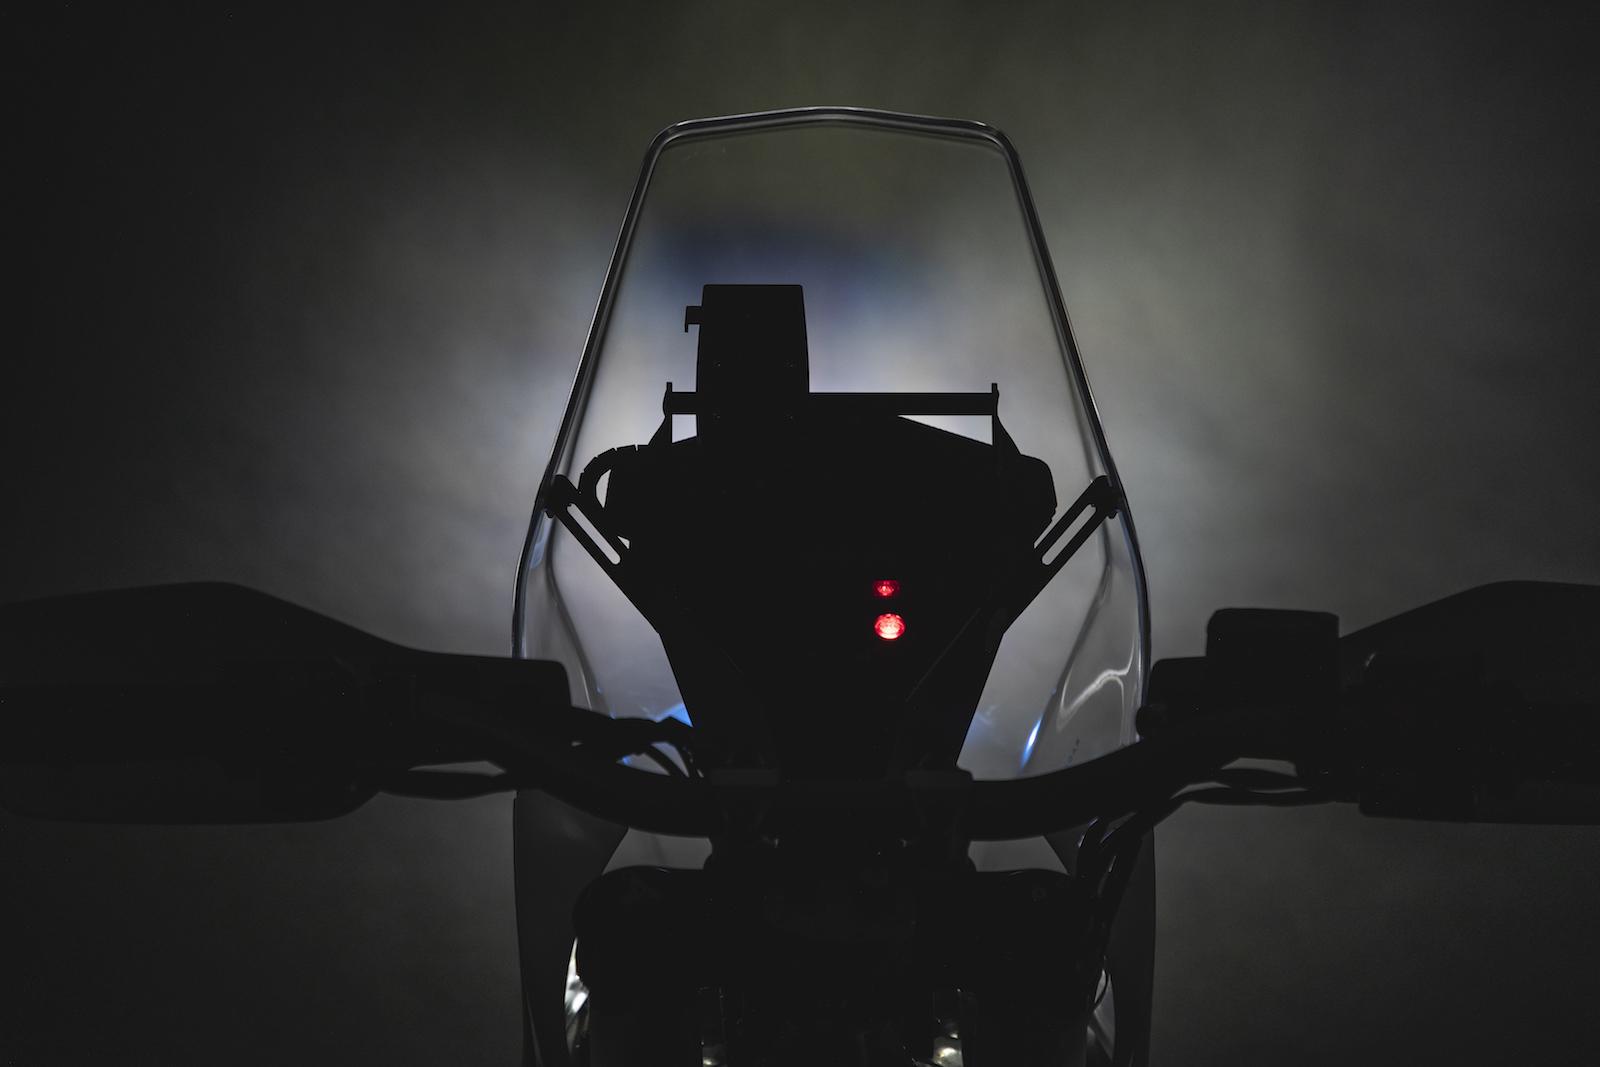 Rallye výbava pro enduro motocykly